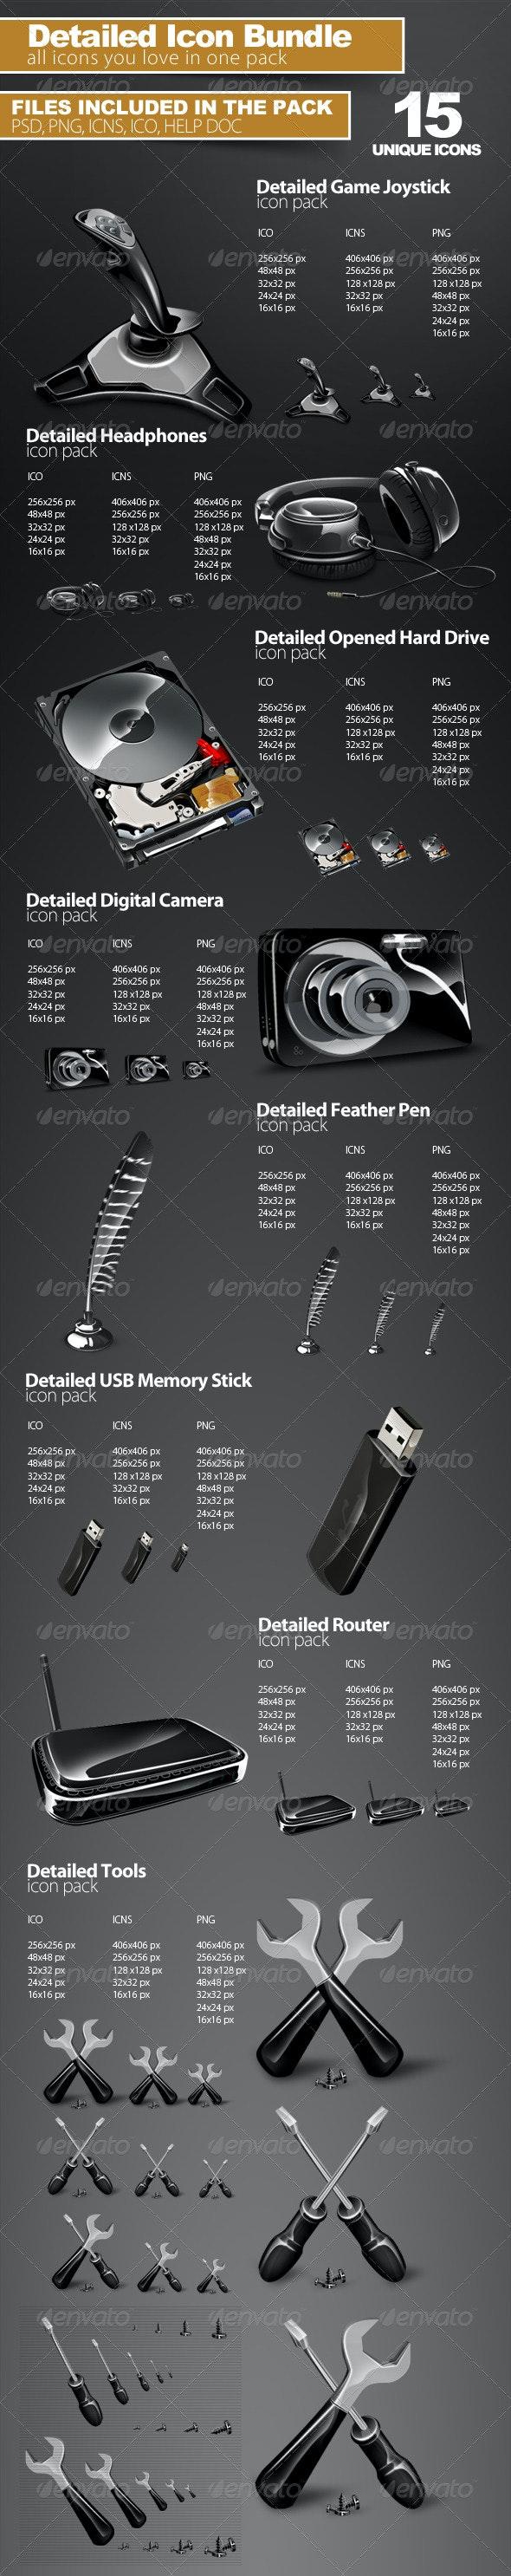 Detailed Icon Bundle - Technology Icons